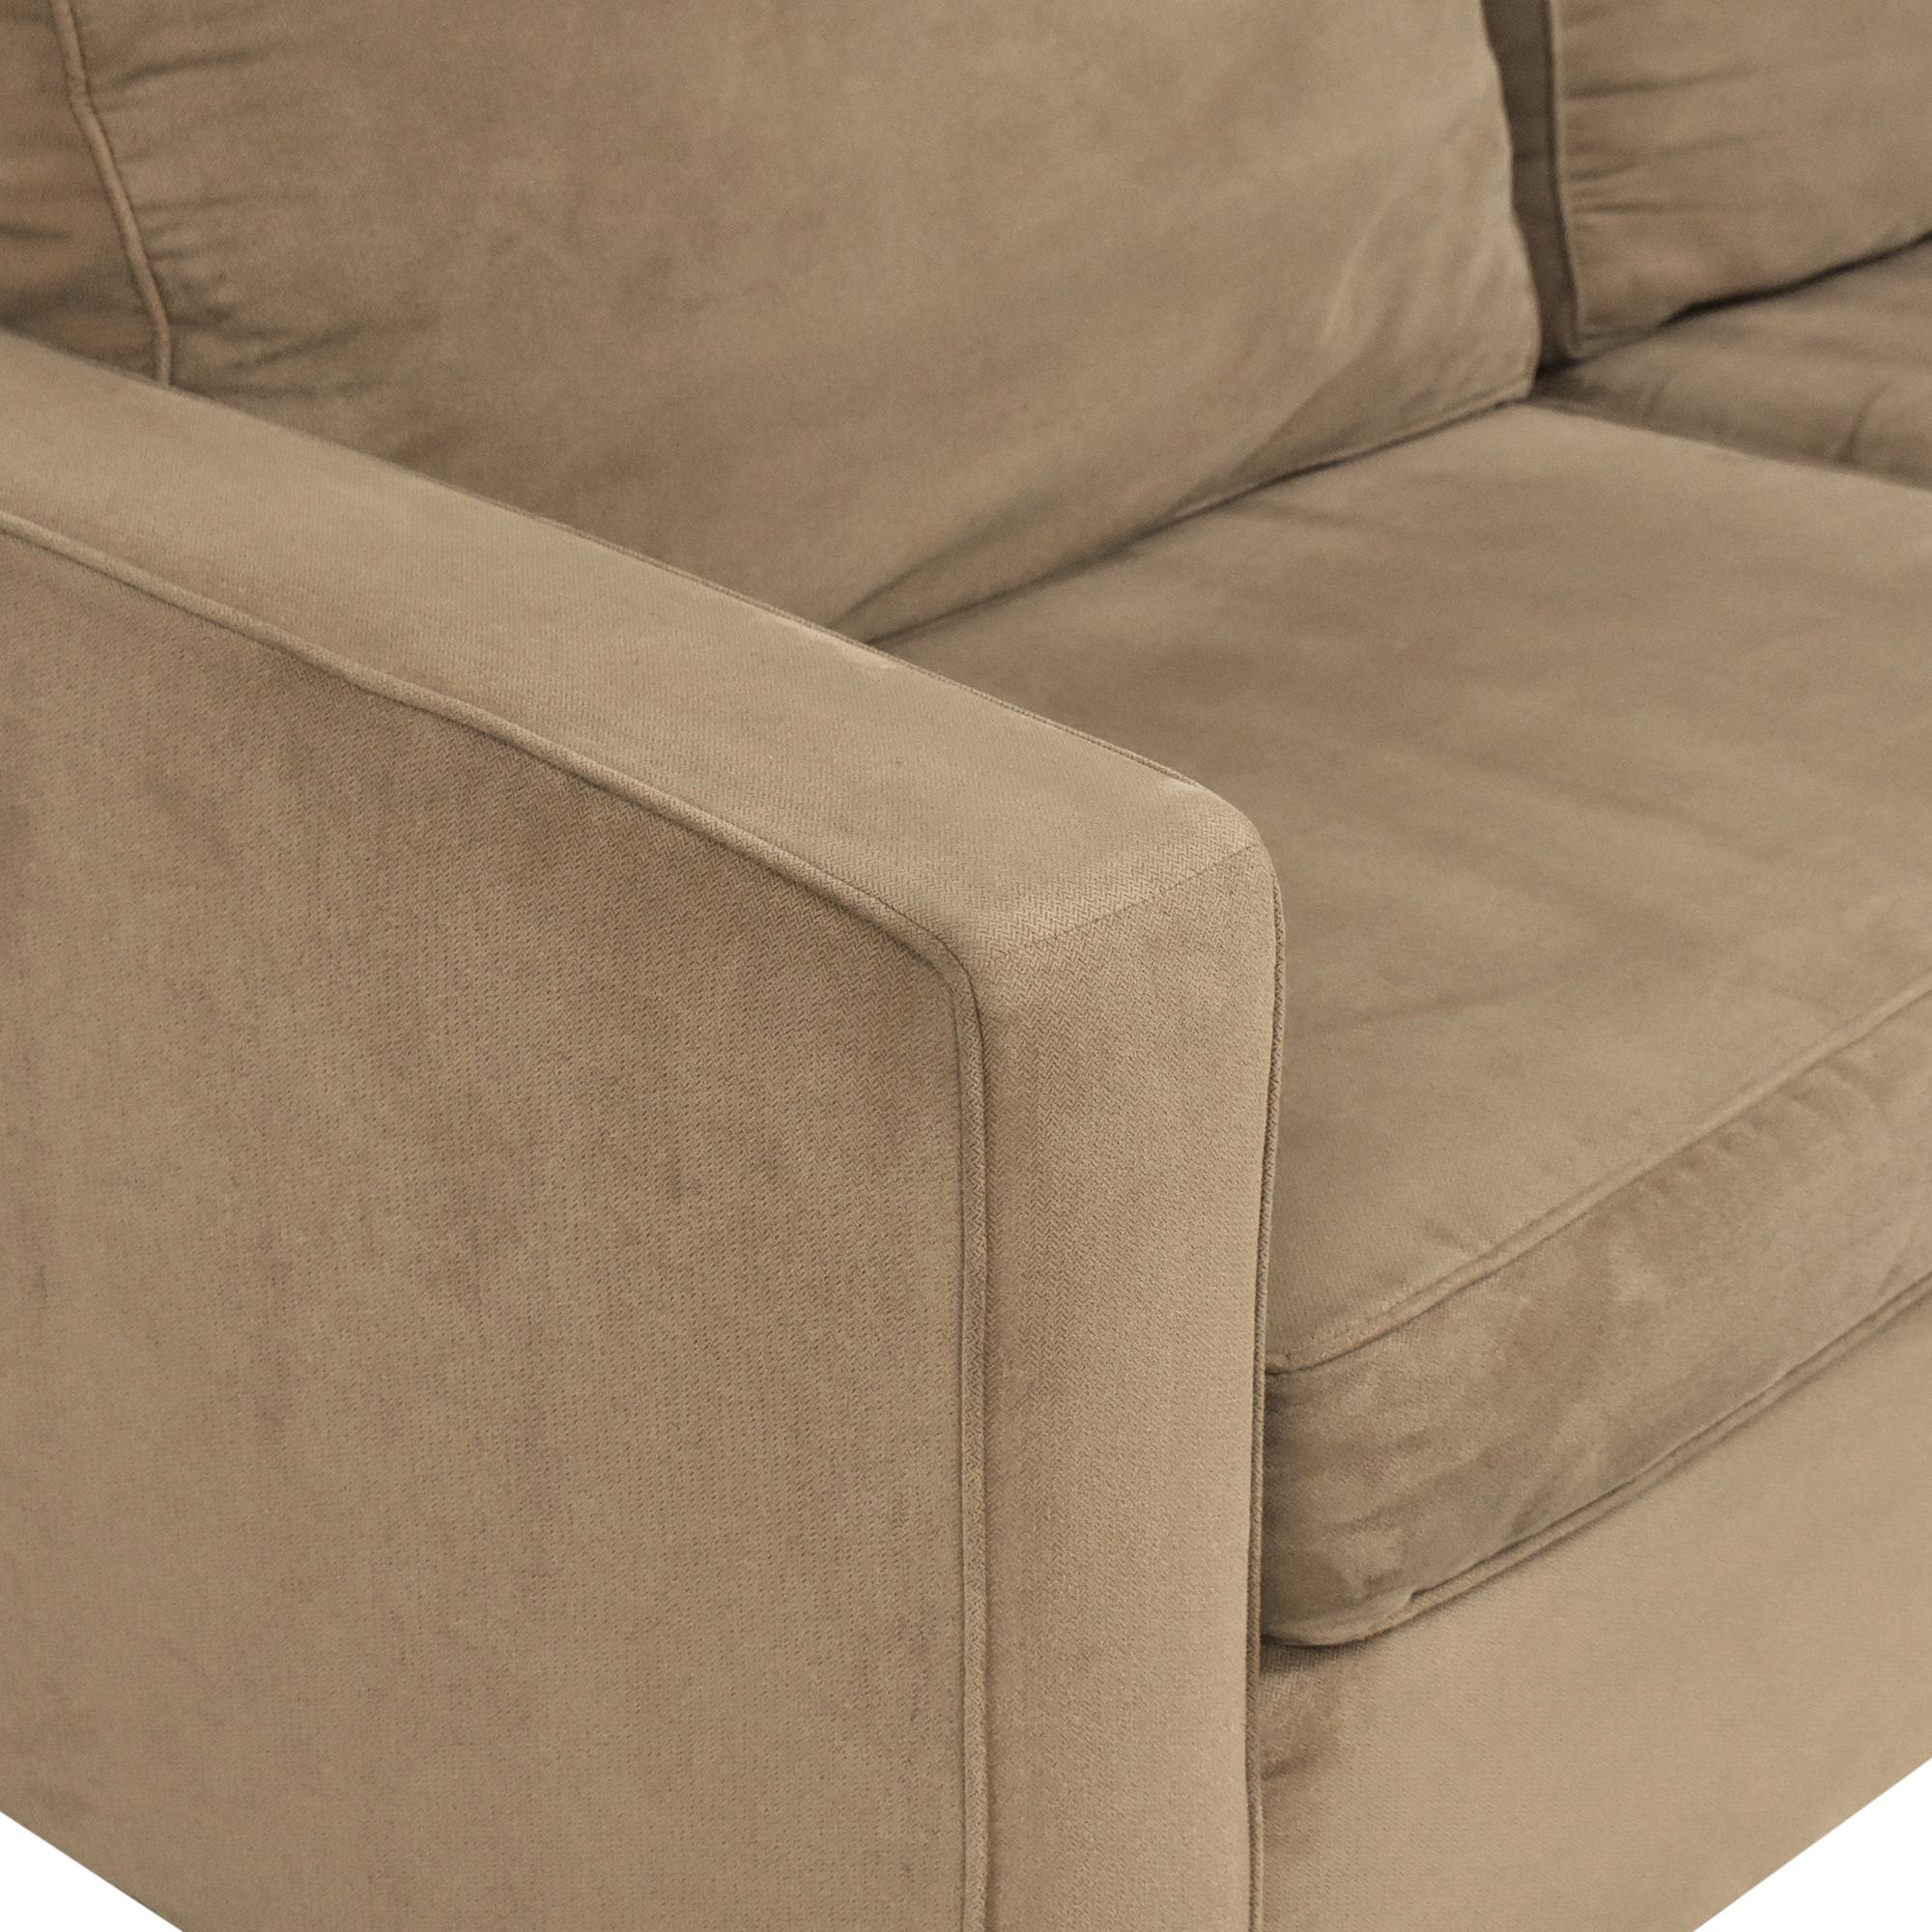 West Elm West Elm Henry Two Cushion Sofa pa